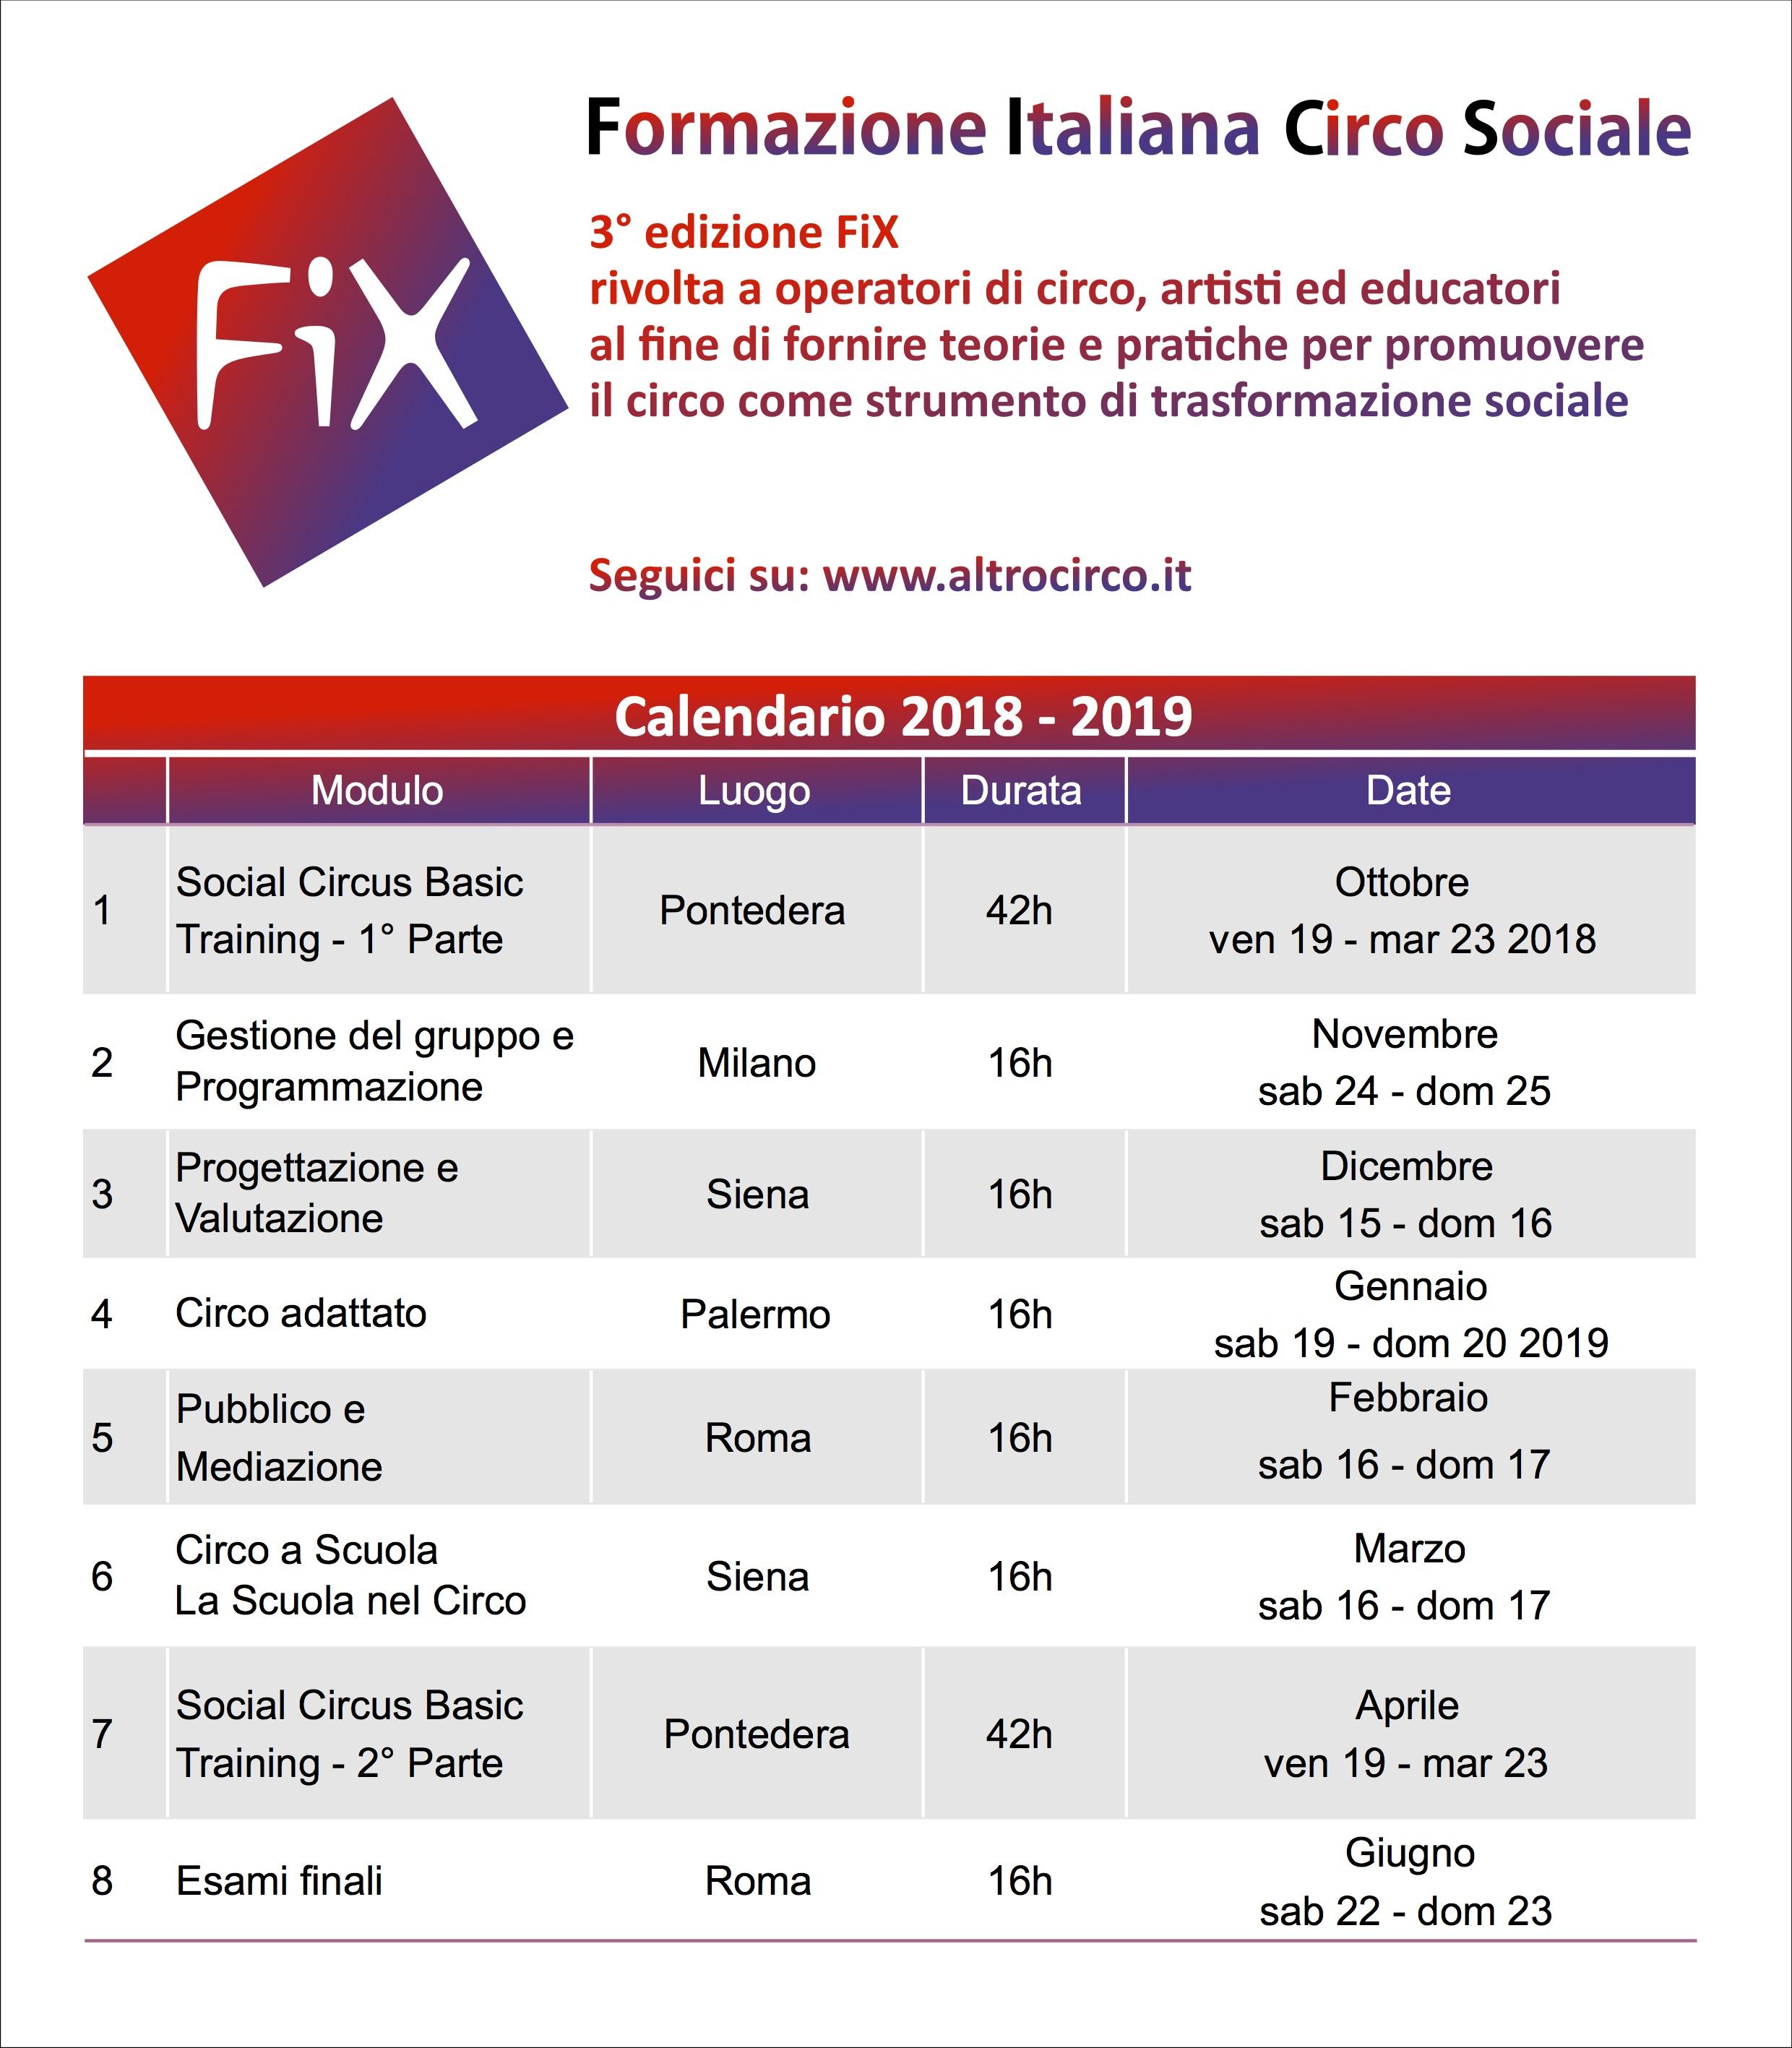 cartolina Fics_2018 - 2pag